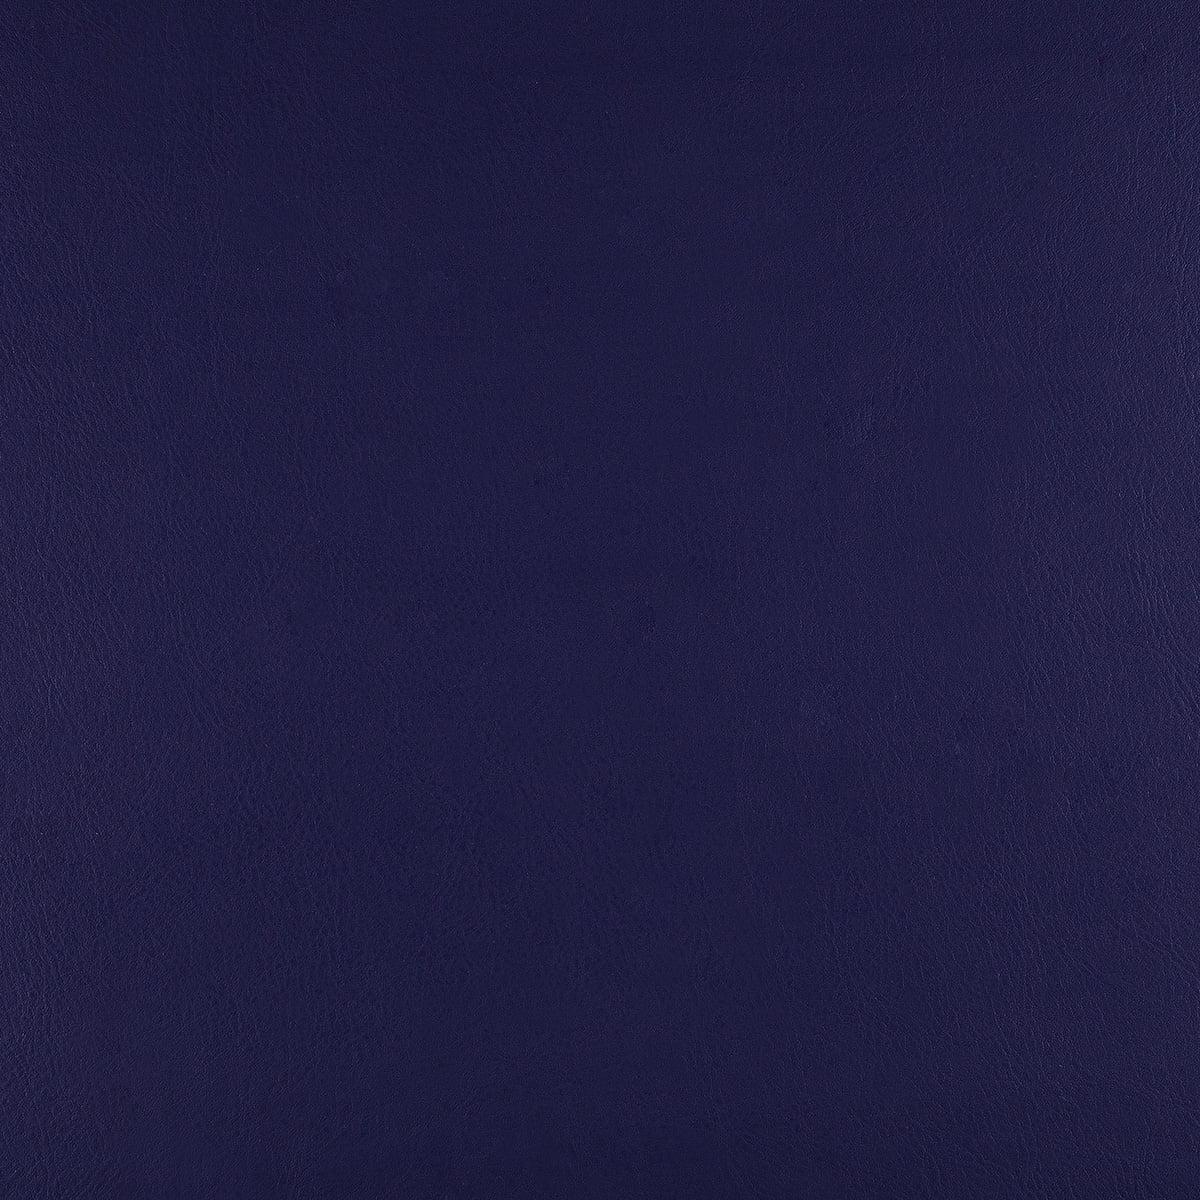 Sapphire Blue nude